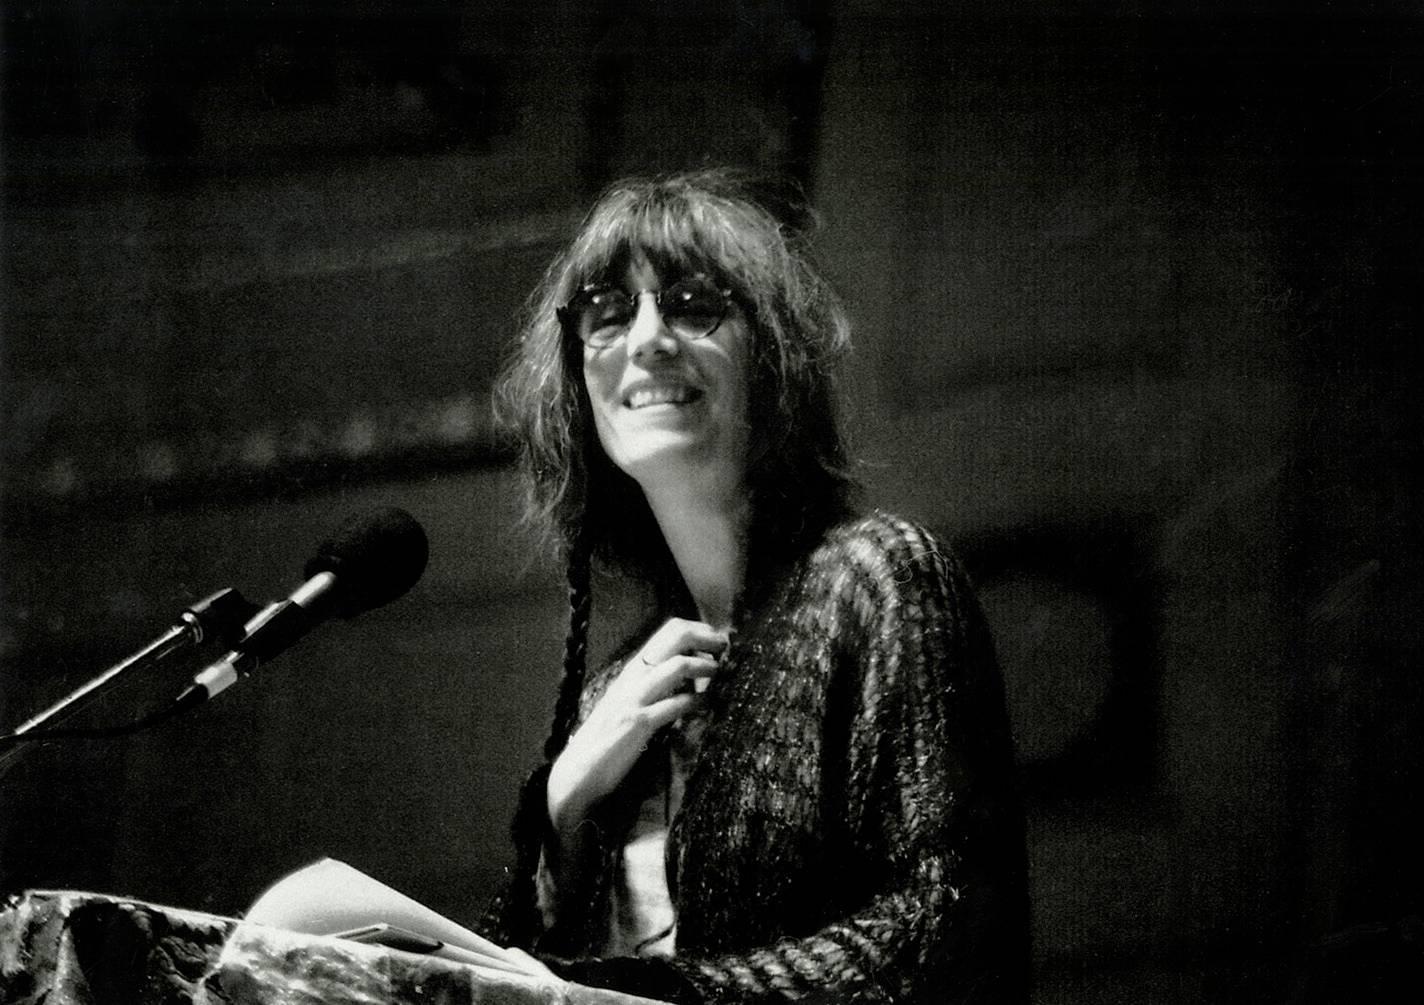 Patti Smith photograph by Detroit photographer Leni Sinclair